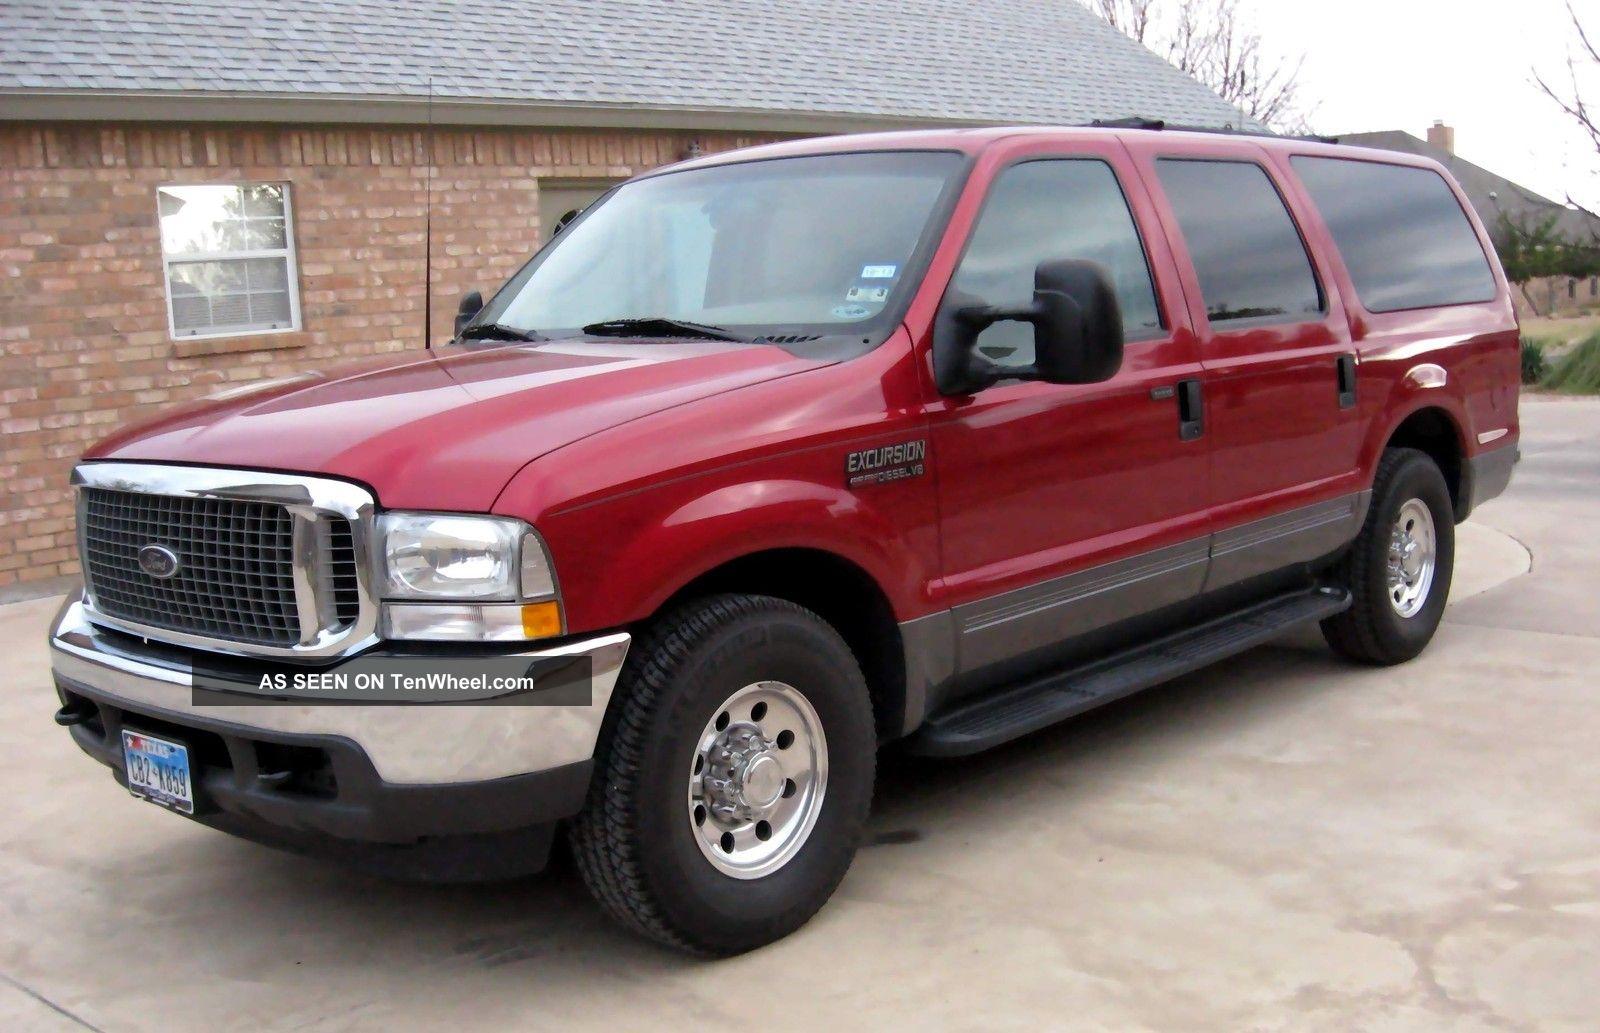 2003 Ford Excursion Xlt Premium Sport Utility 4 - Door 7 ...